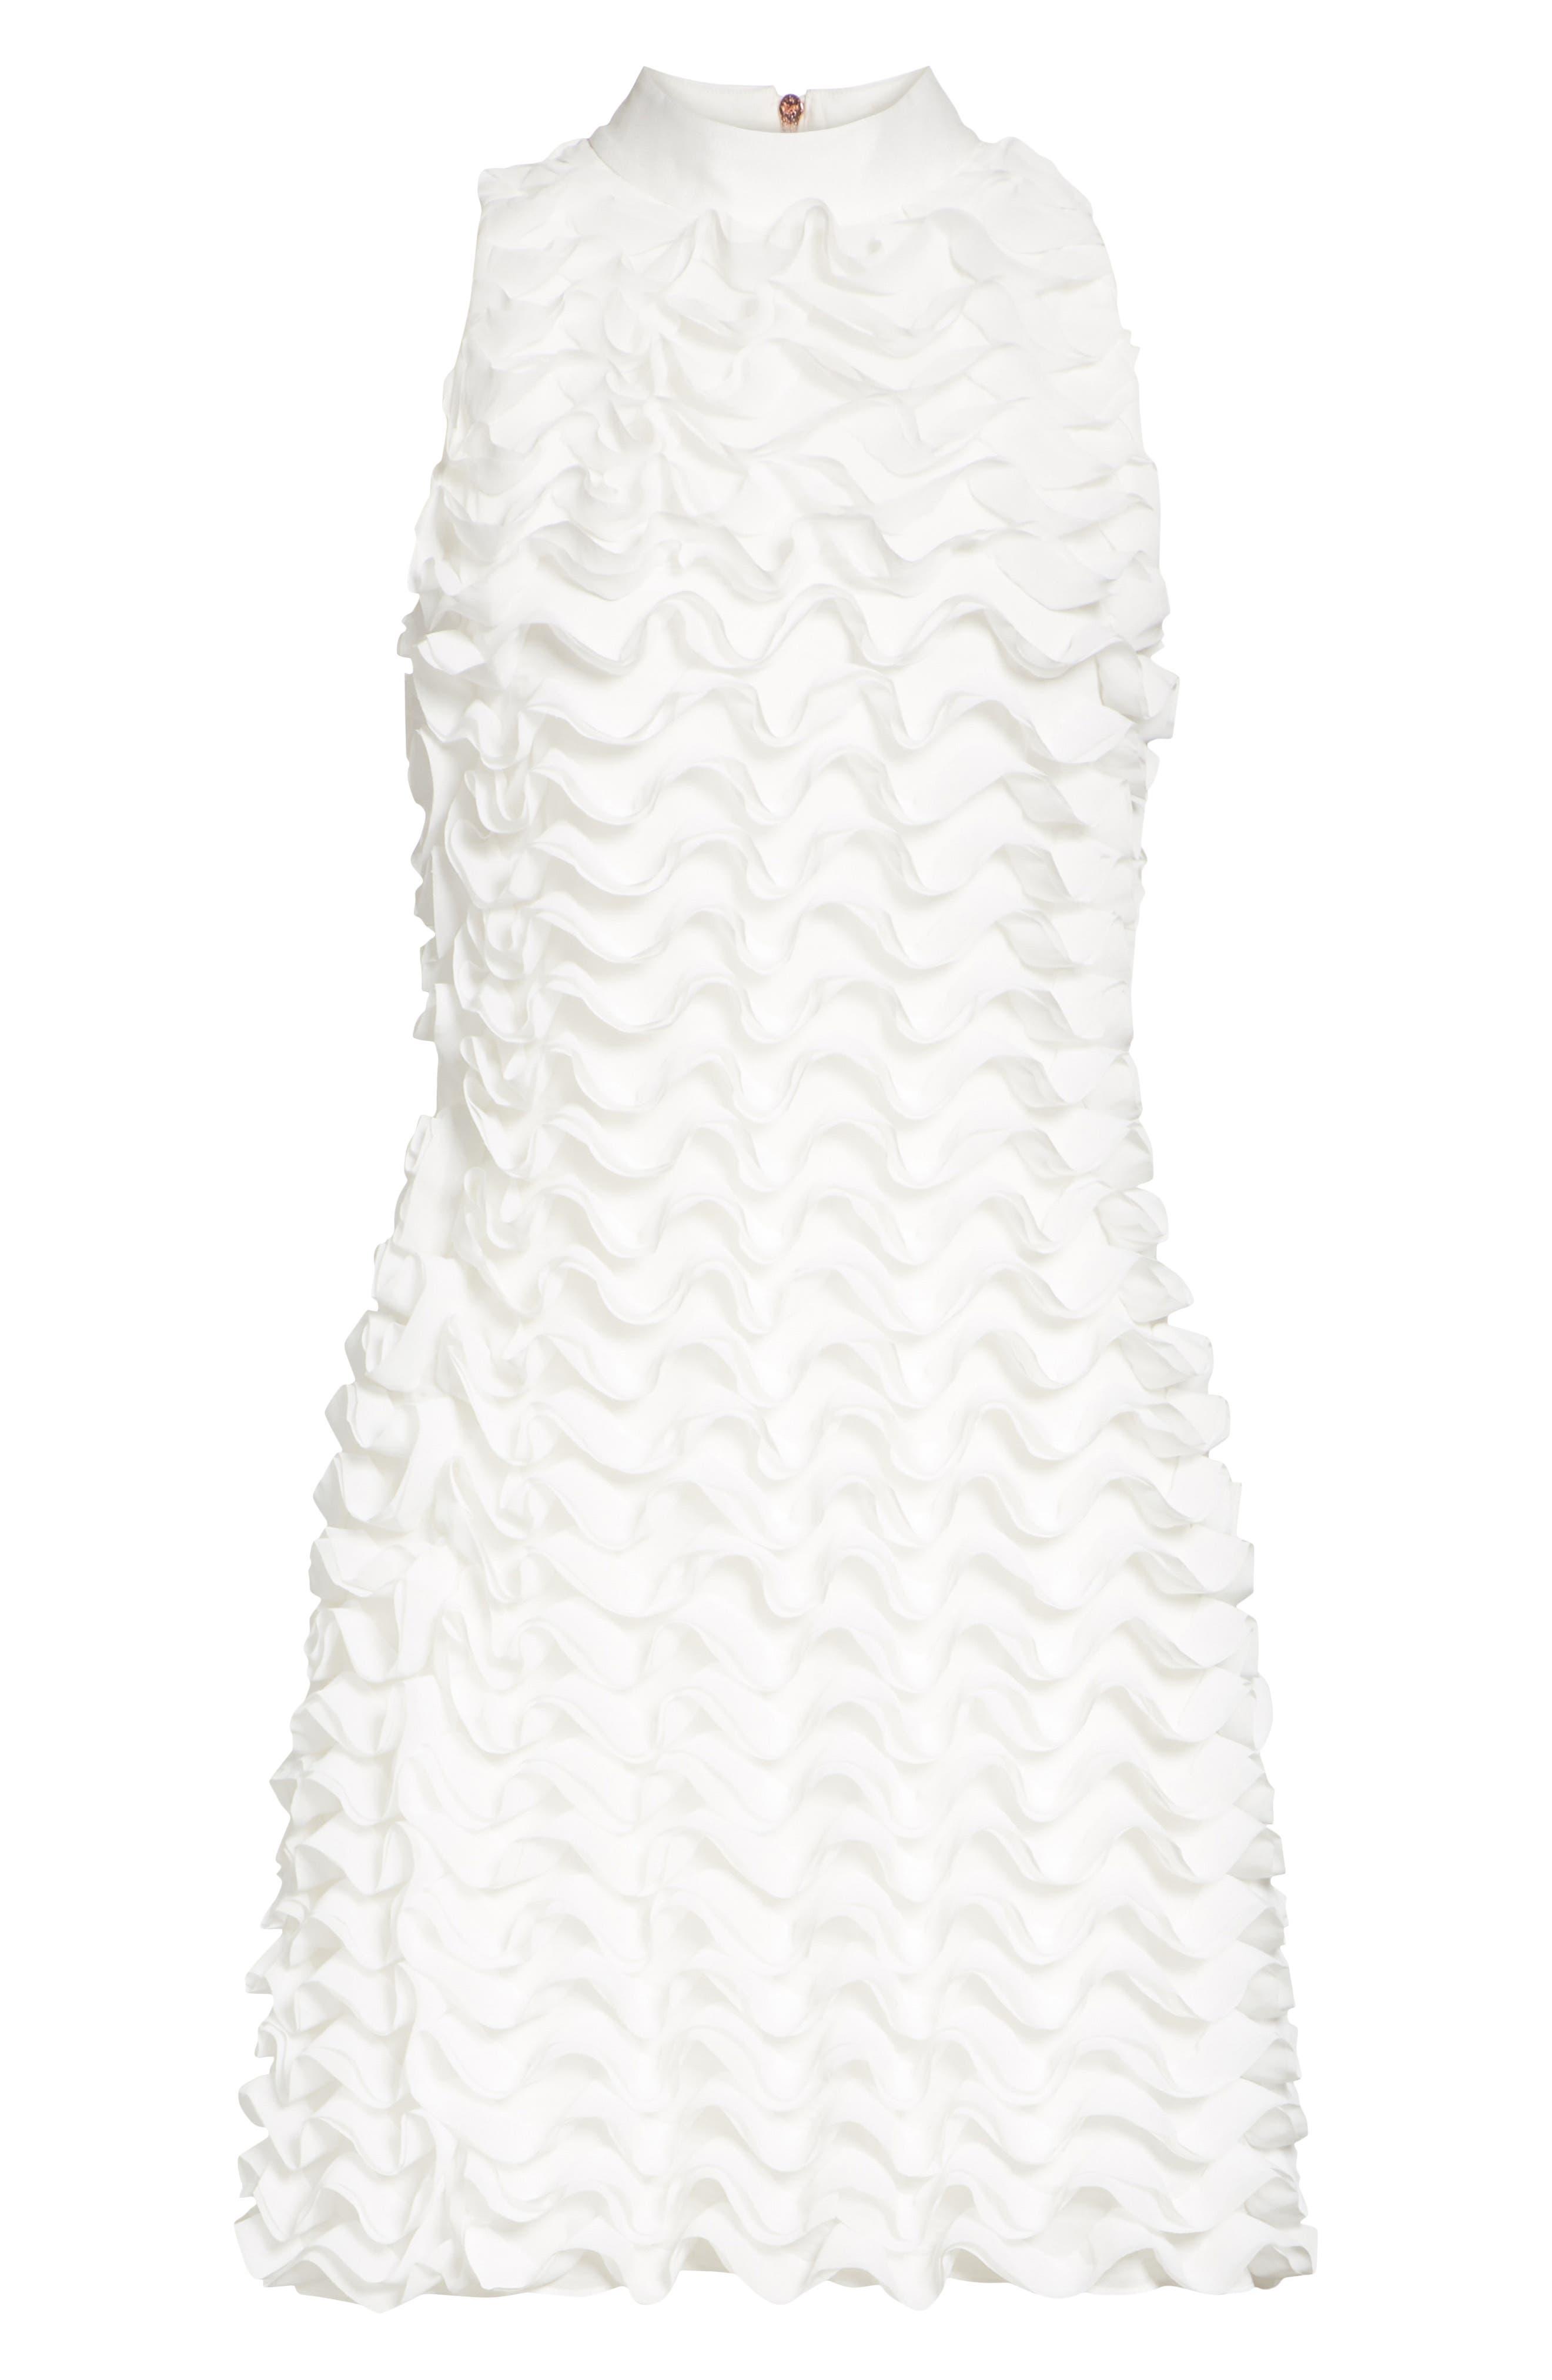 Ruffled Tunic Dress,                             Alternate thumbnail 6, color,                             White